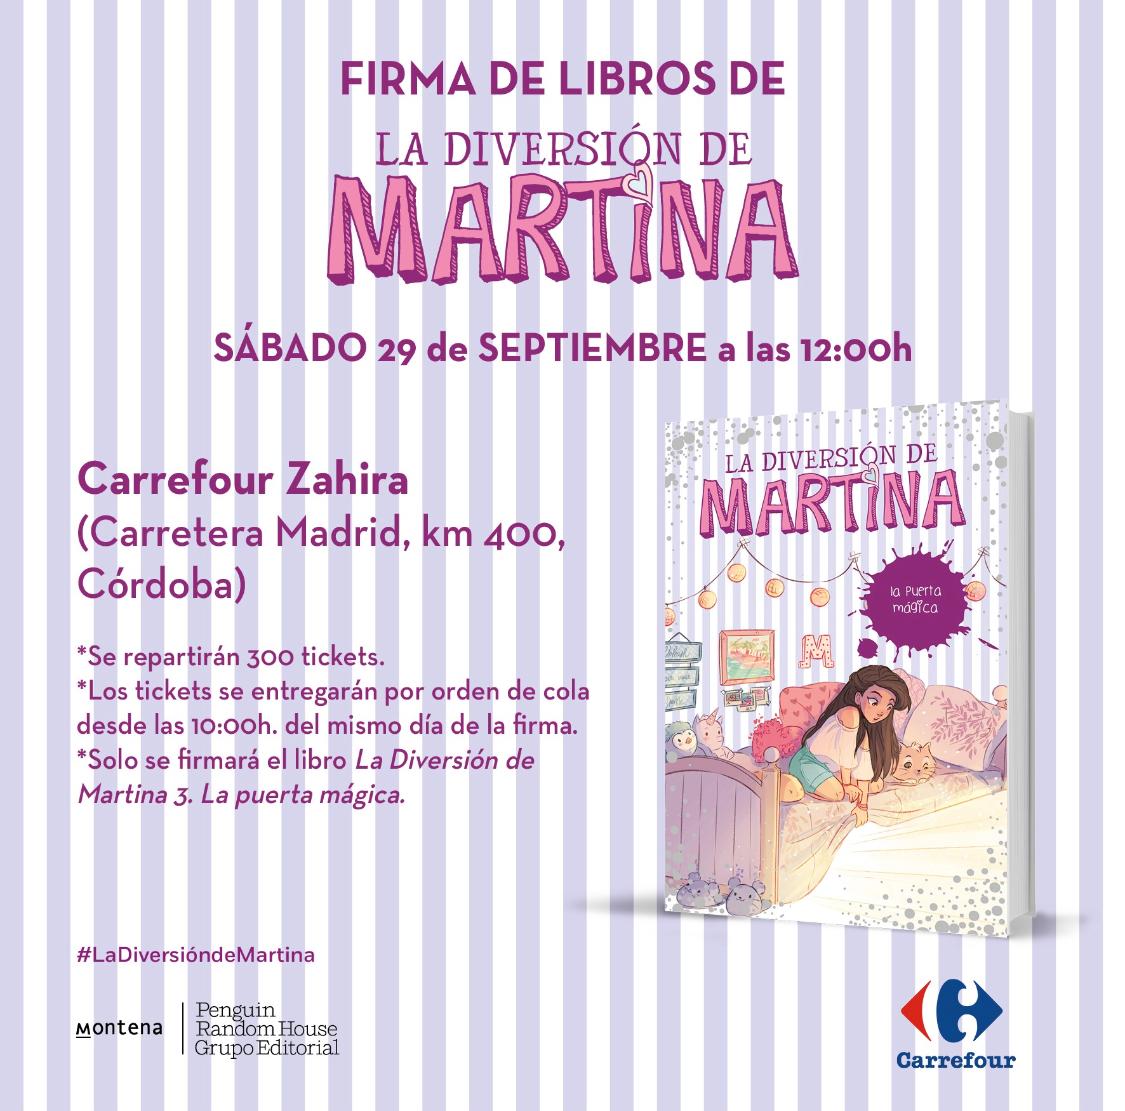 Firma de libros 29 de septiembre